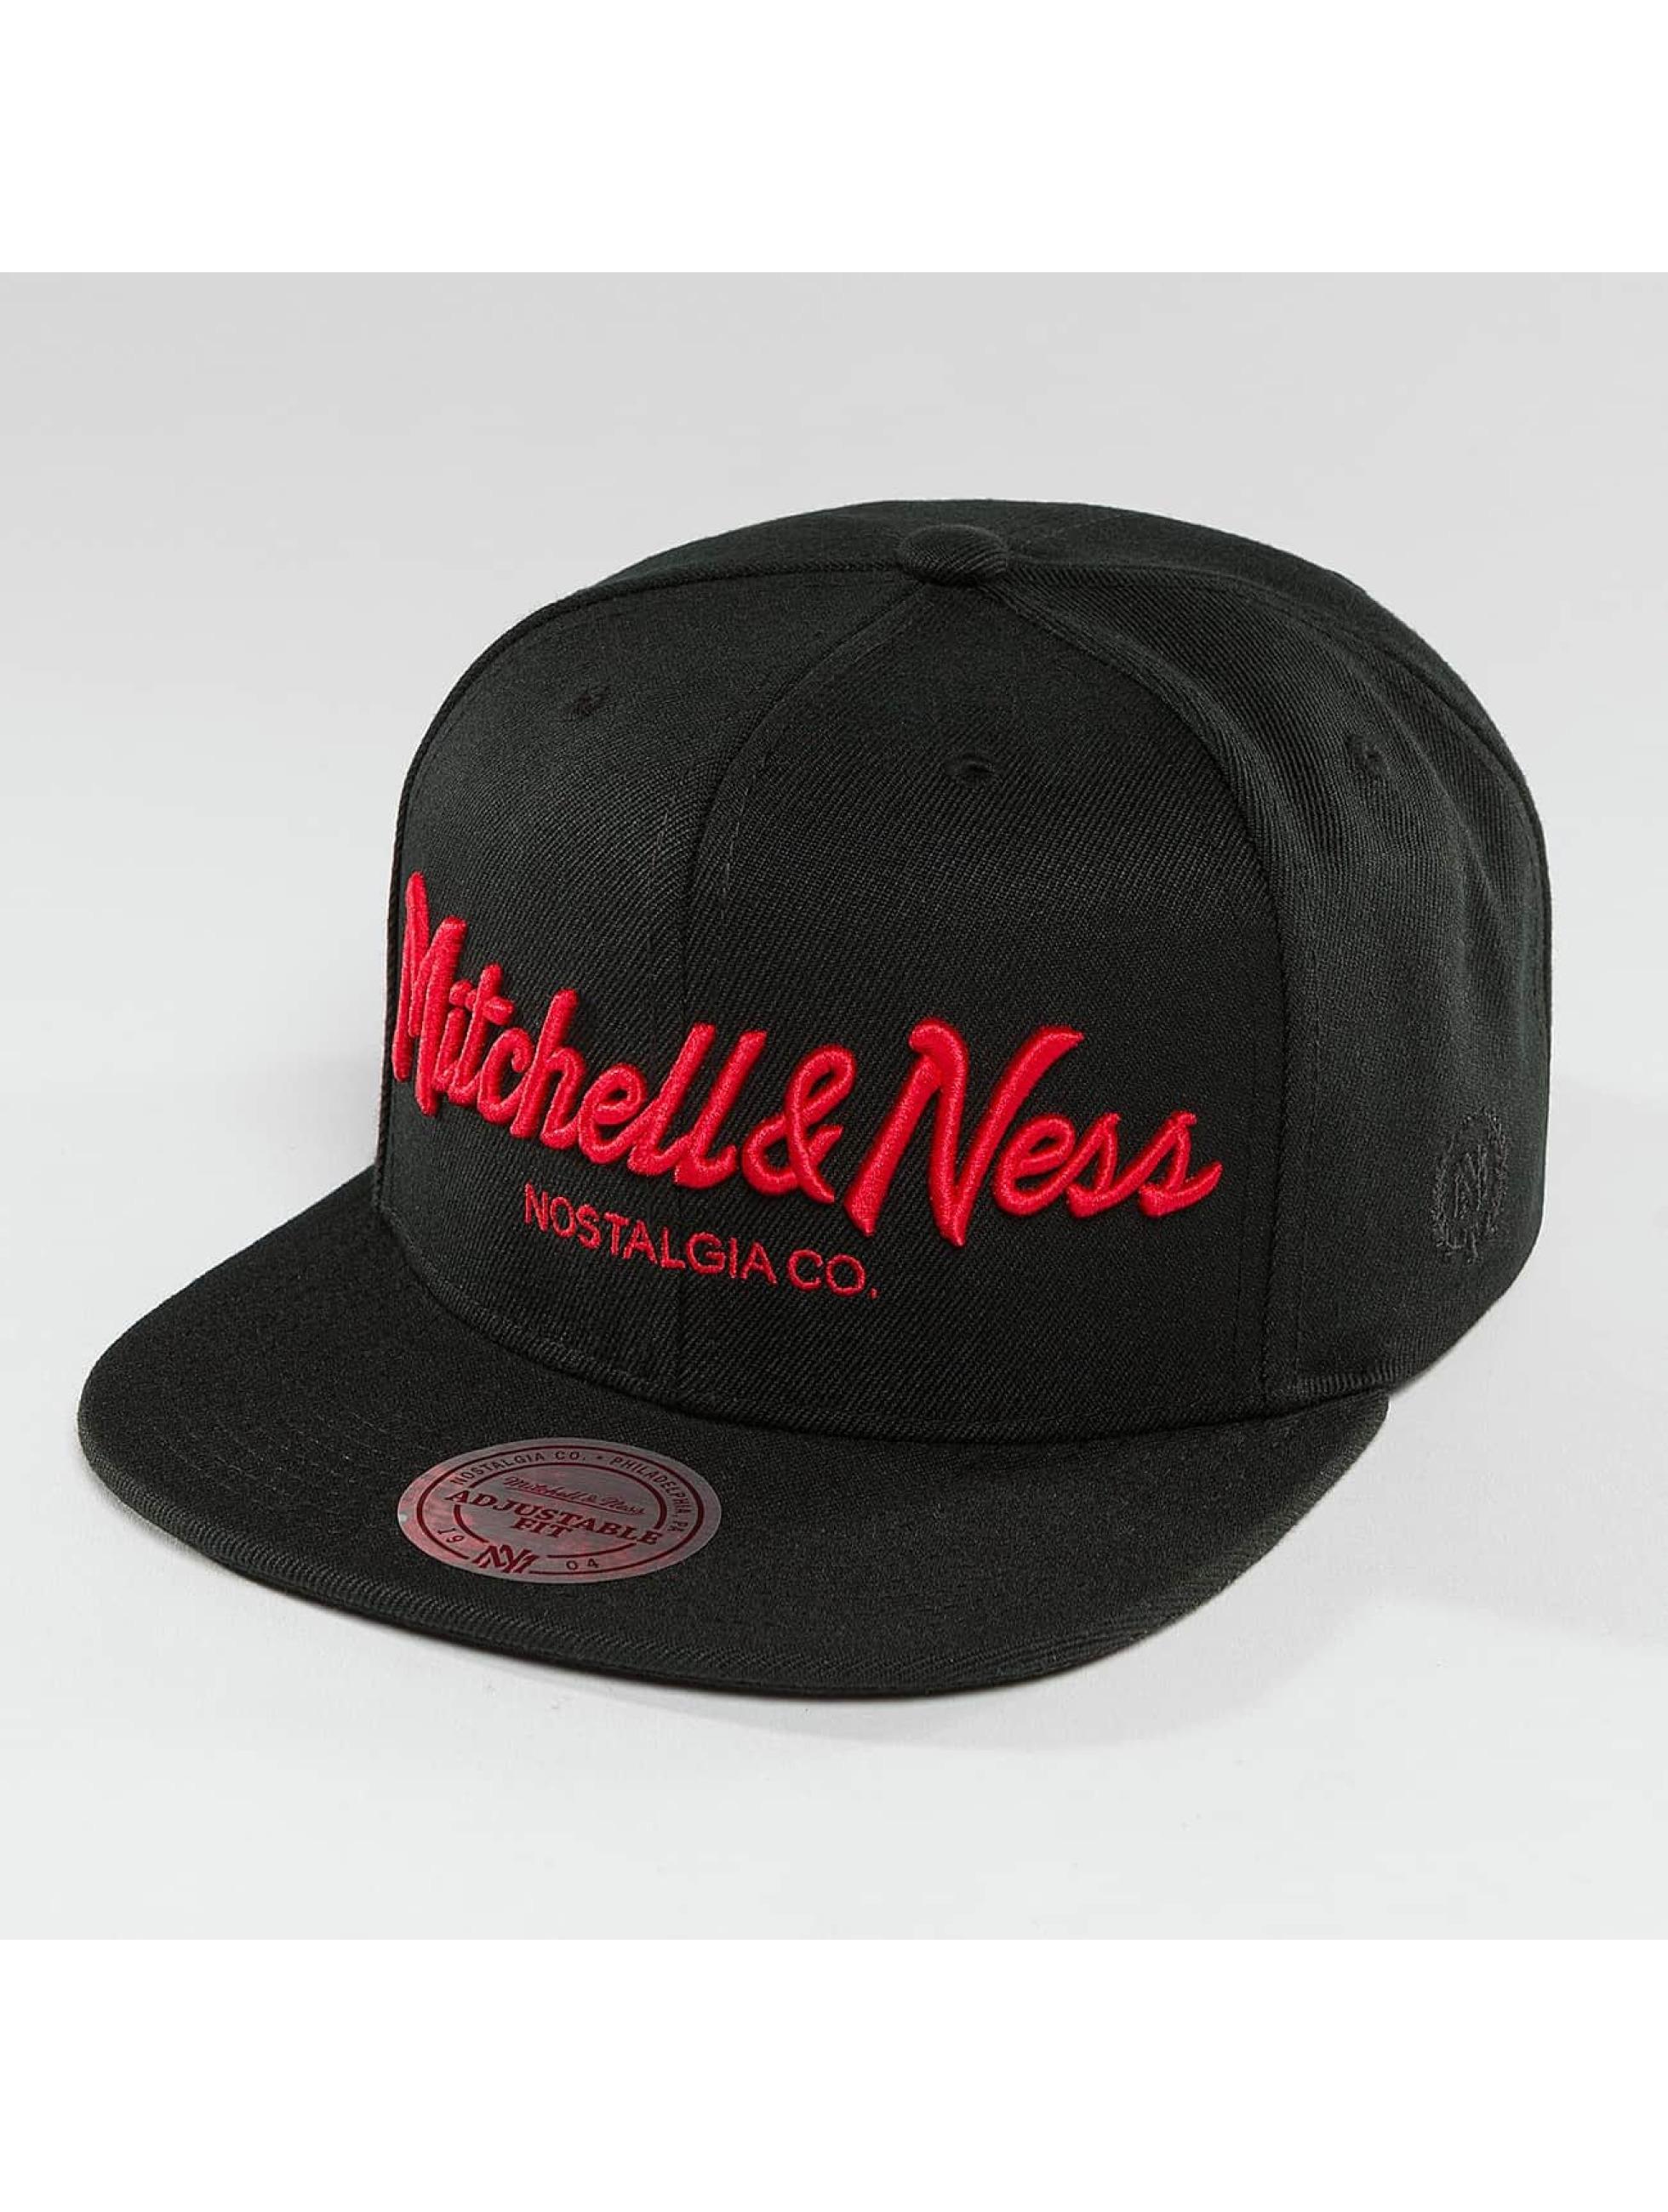 Mitchell & Ness Casquette Snapback & Strapback Red Pop Pinscript noir